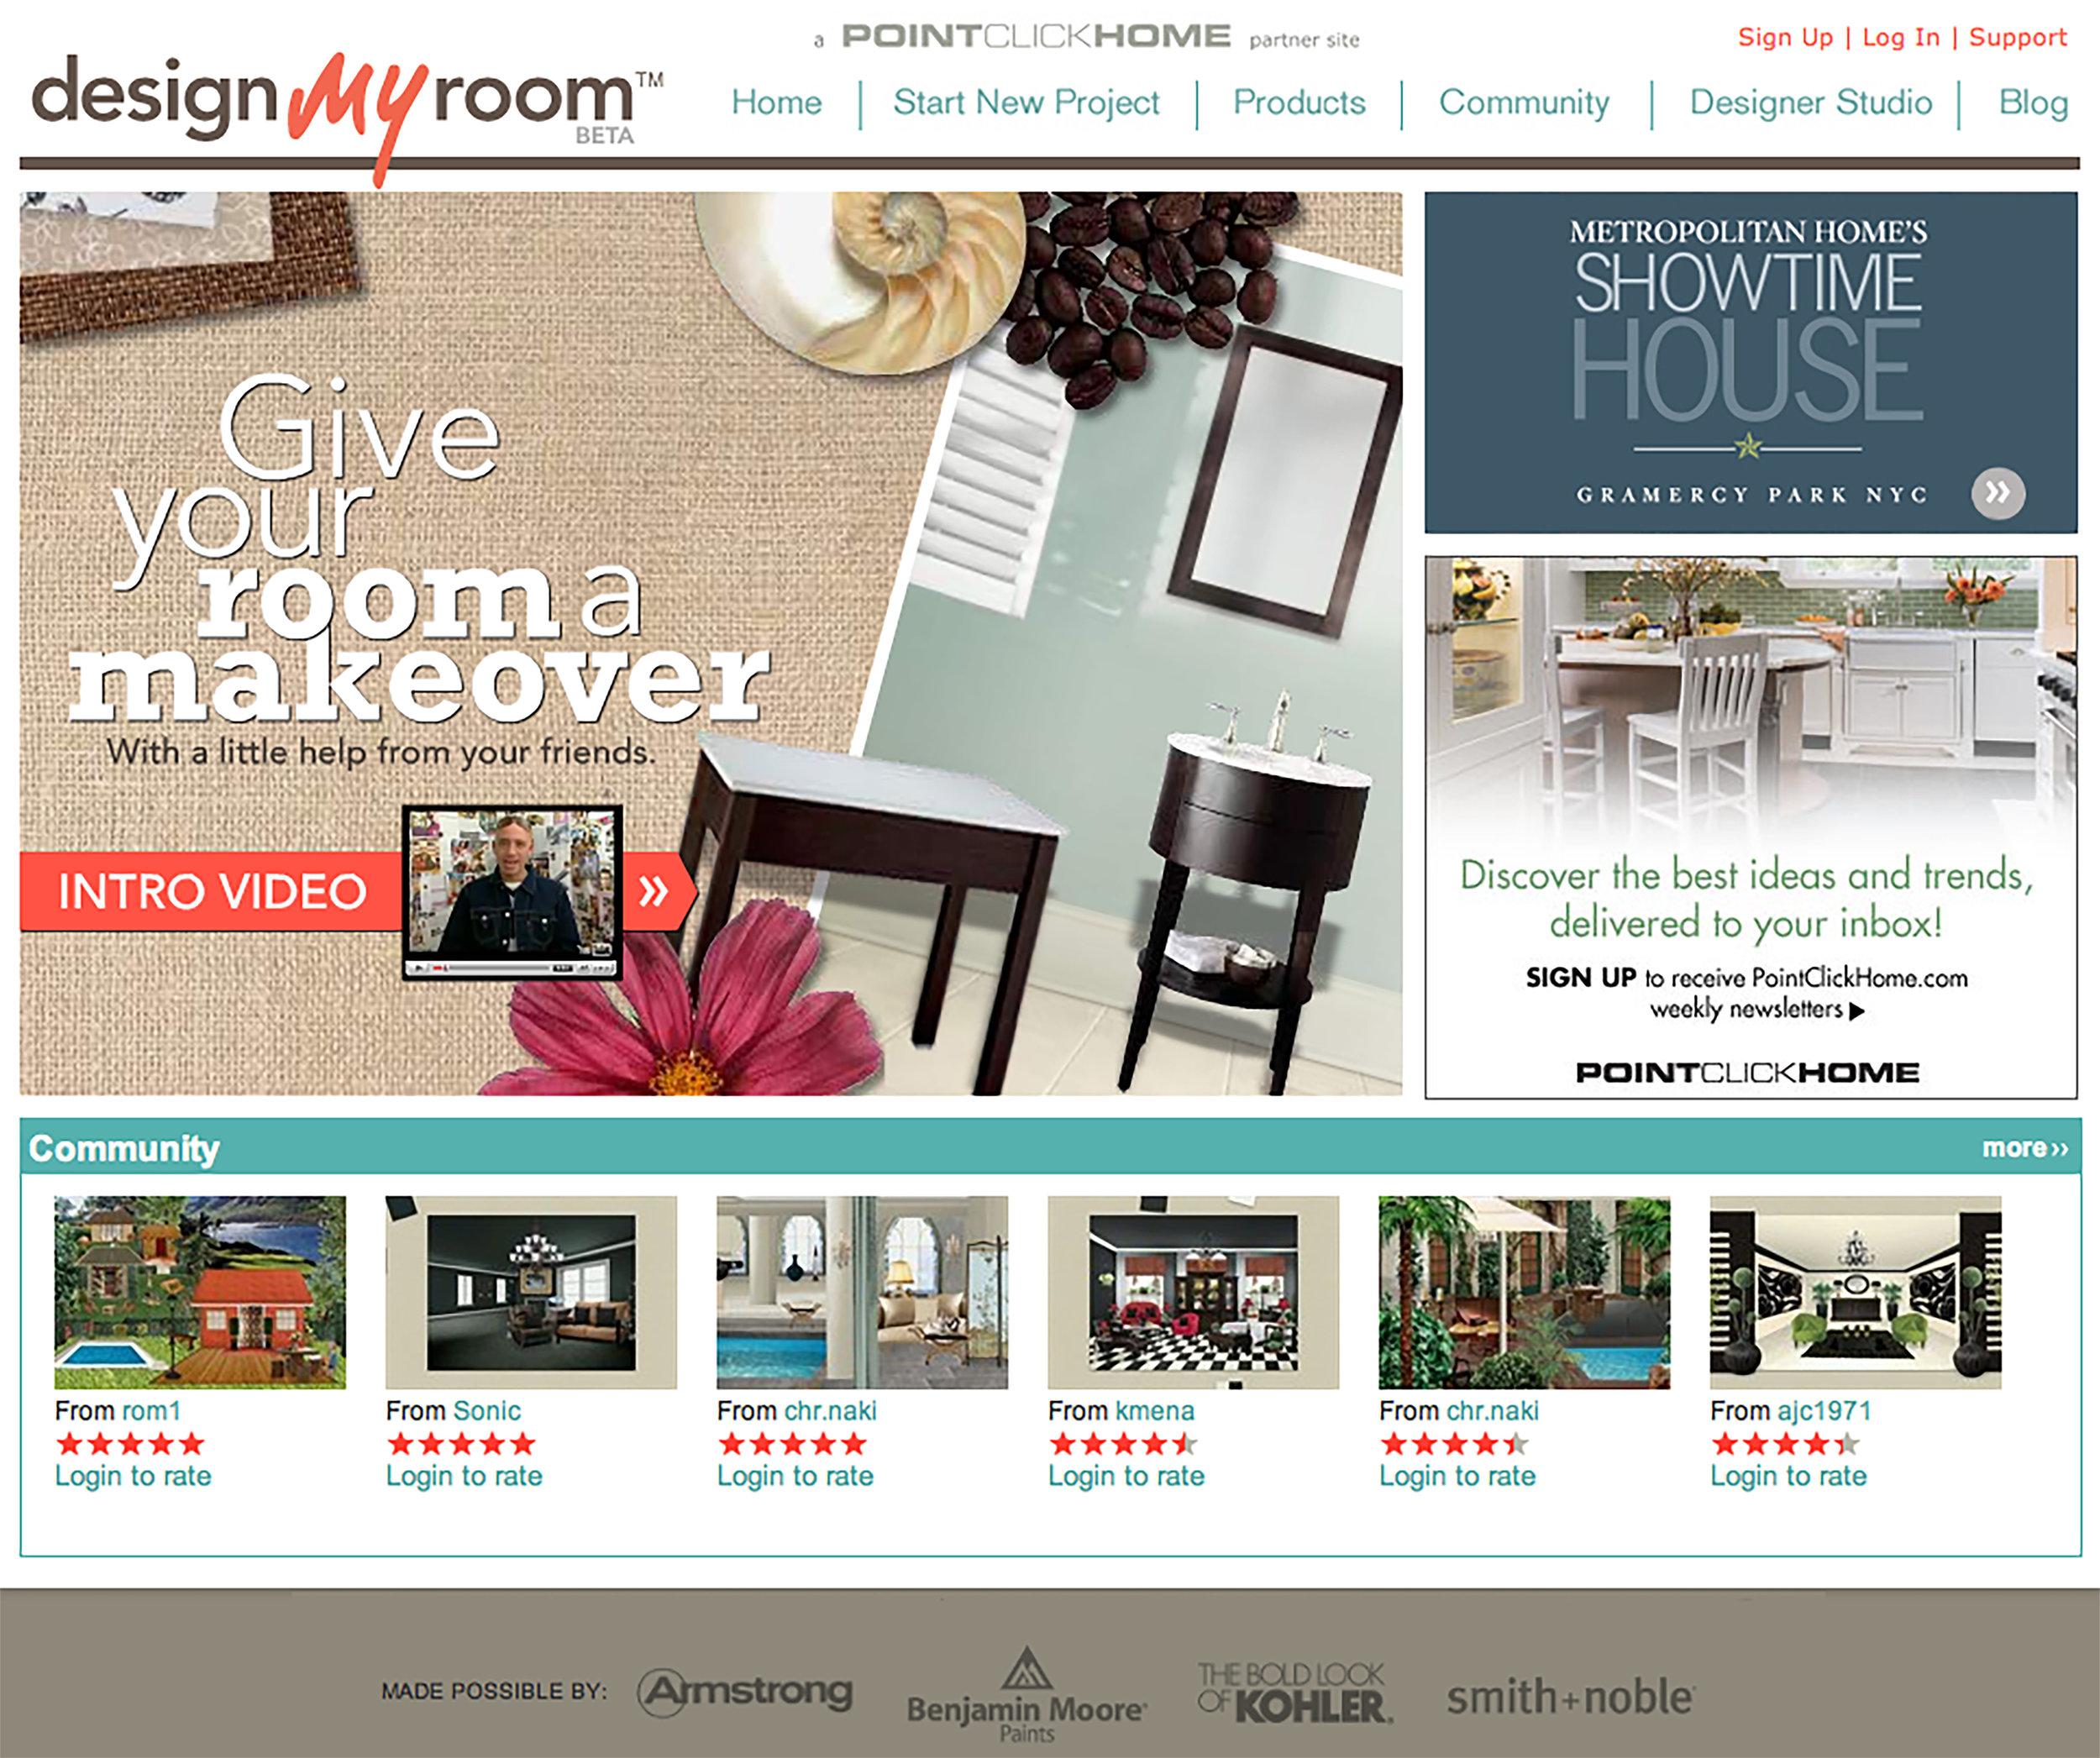 design my room_web_1.jpg